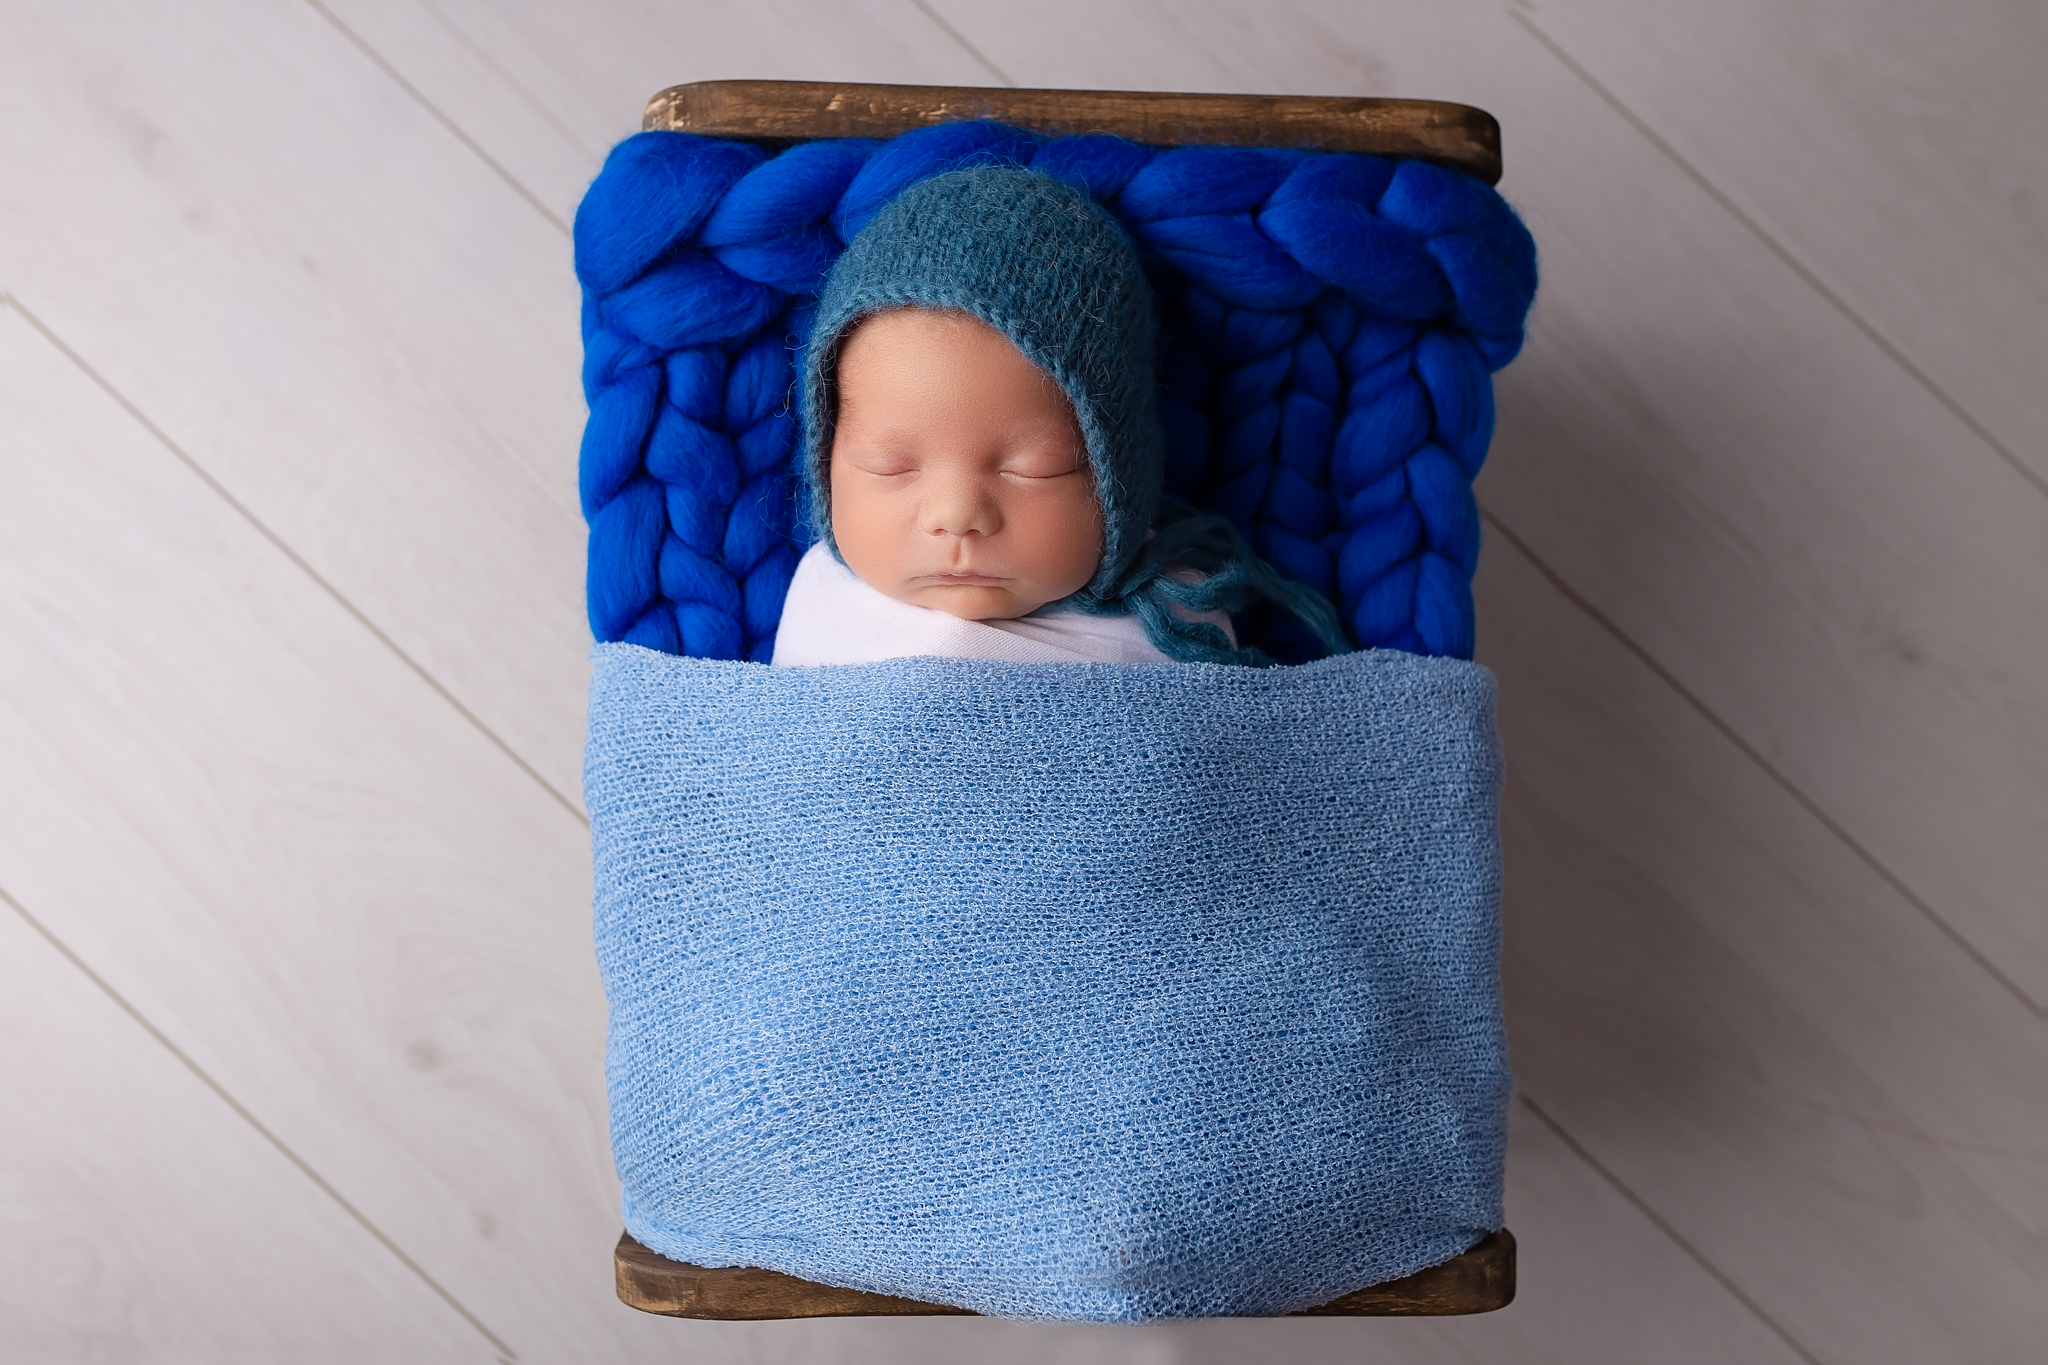 Newborn photographer Leeds, York, Bradford, Harrogate, Wakefield: newborn baby boy sleeping in a tiny bed during his newborn photoshoot in Leeds